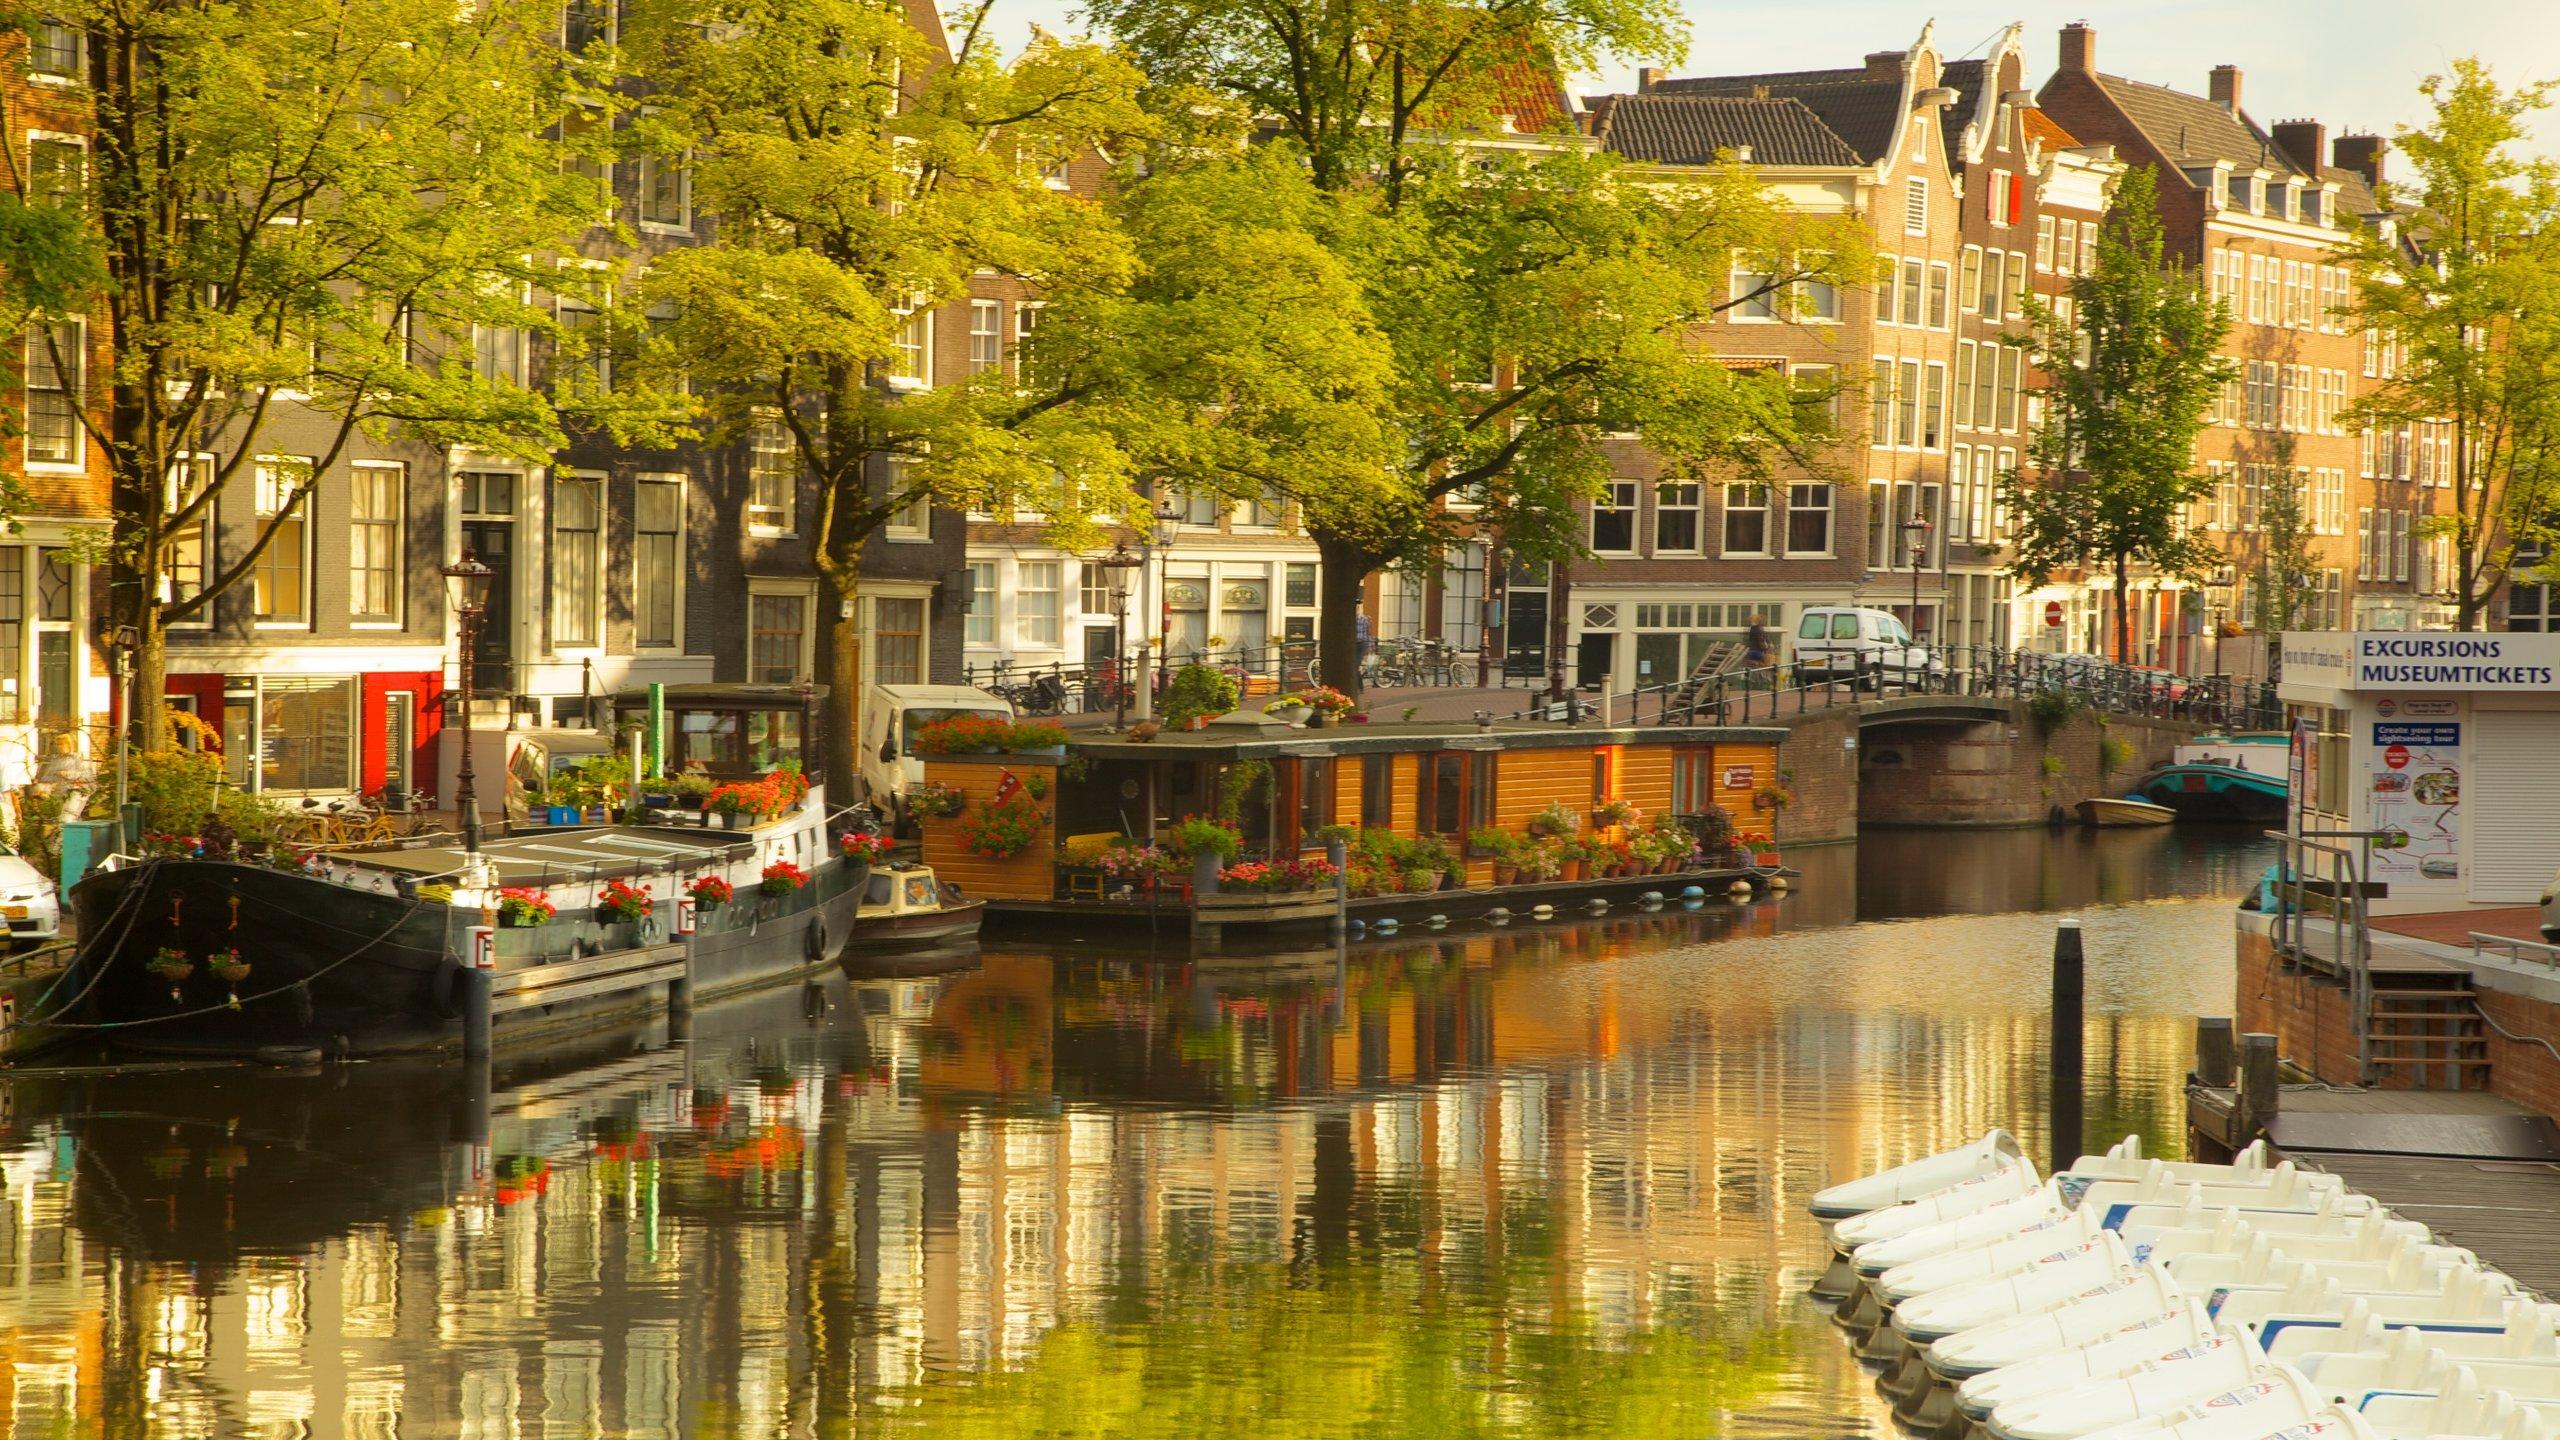 Cintura dei canali, Amsterdam, Olanda Settentrionale, Paesi Bassi